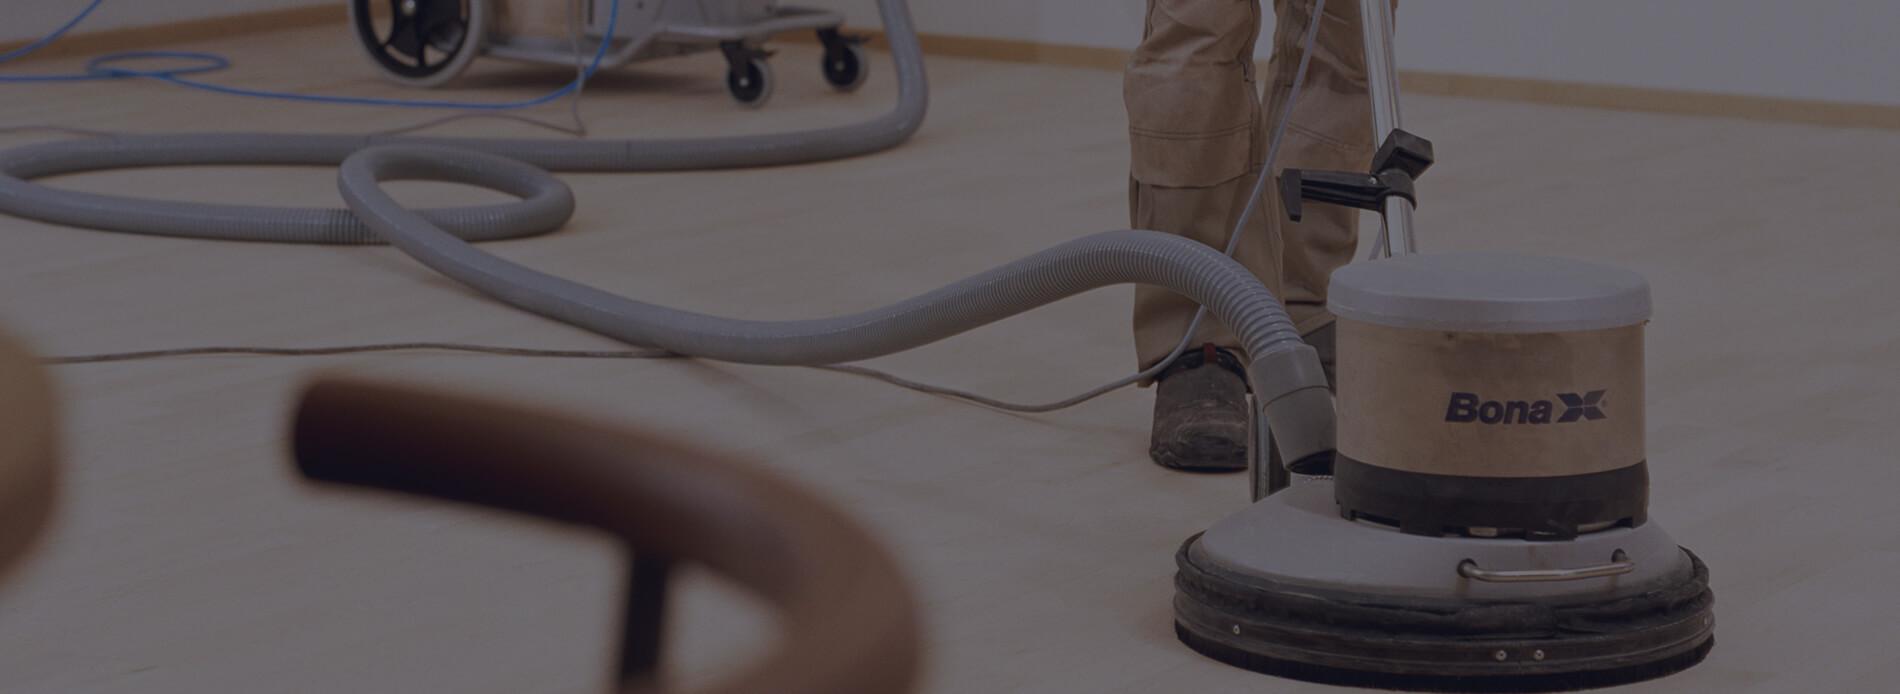 hardwood floor refinishing fayetteville nc of pdi rentals repairs sales hardwood flooring tools us shipping in renttoown